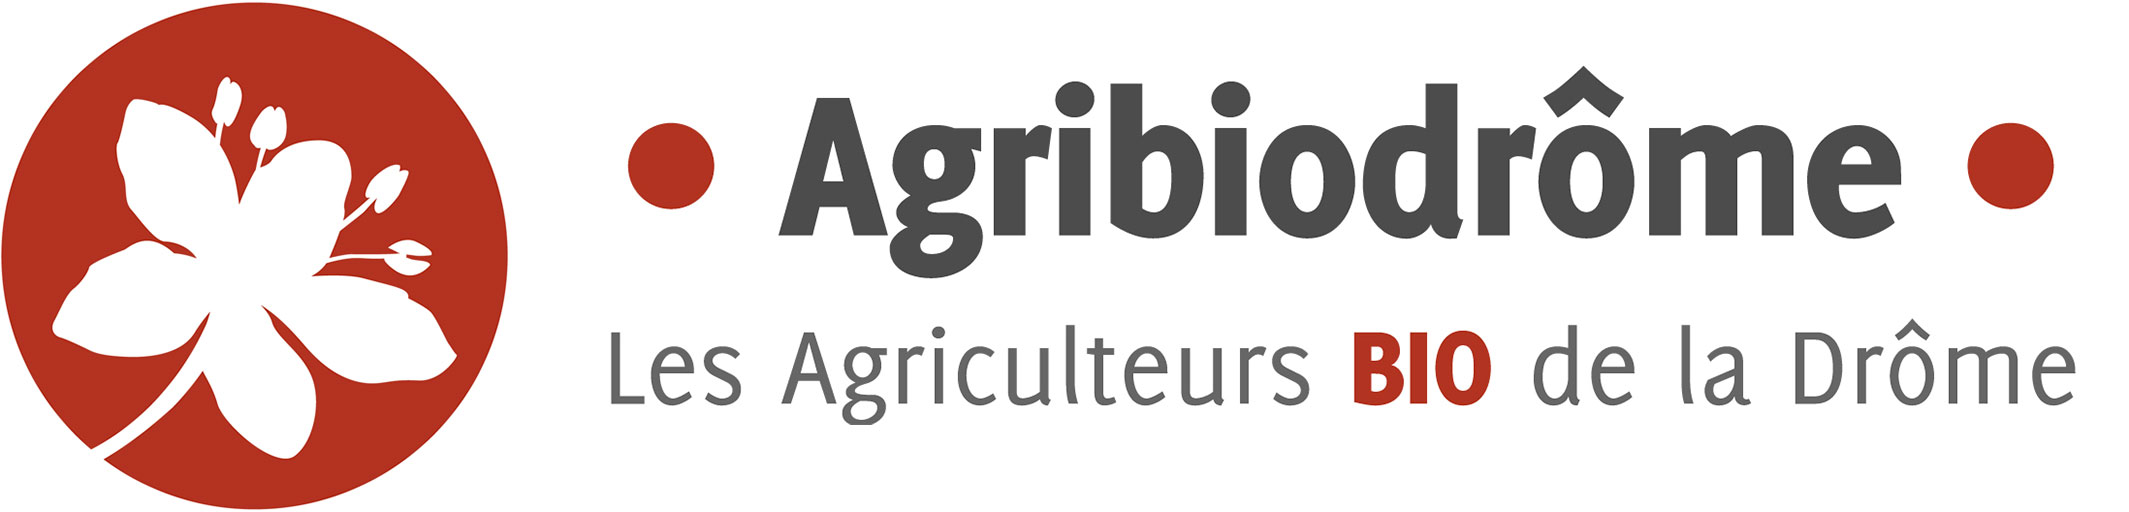 Agribiodrôme